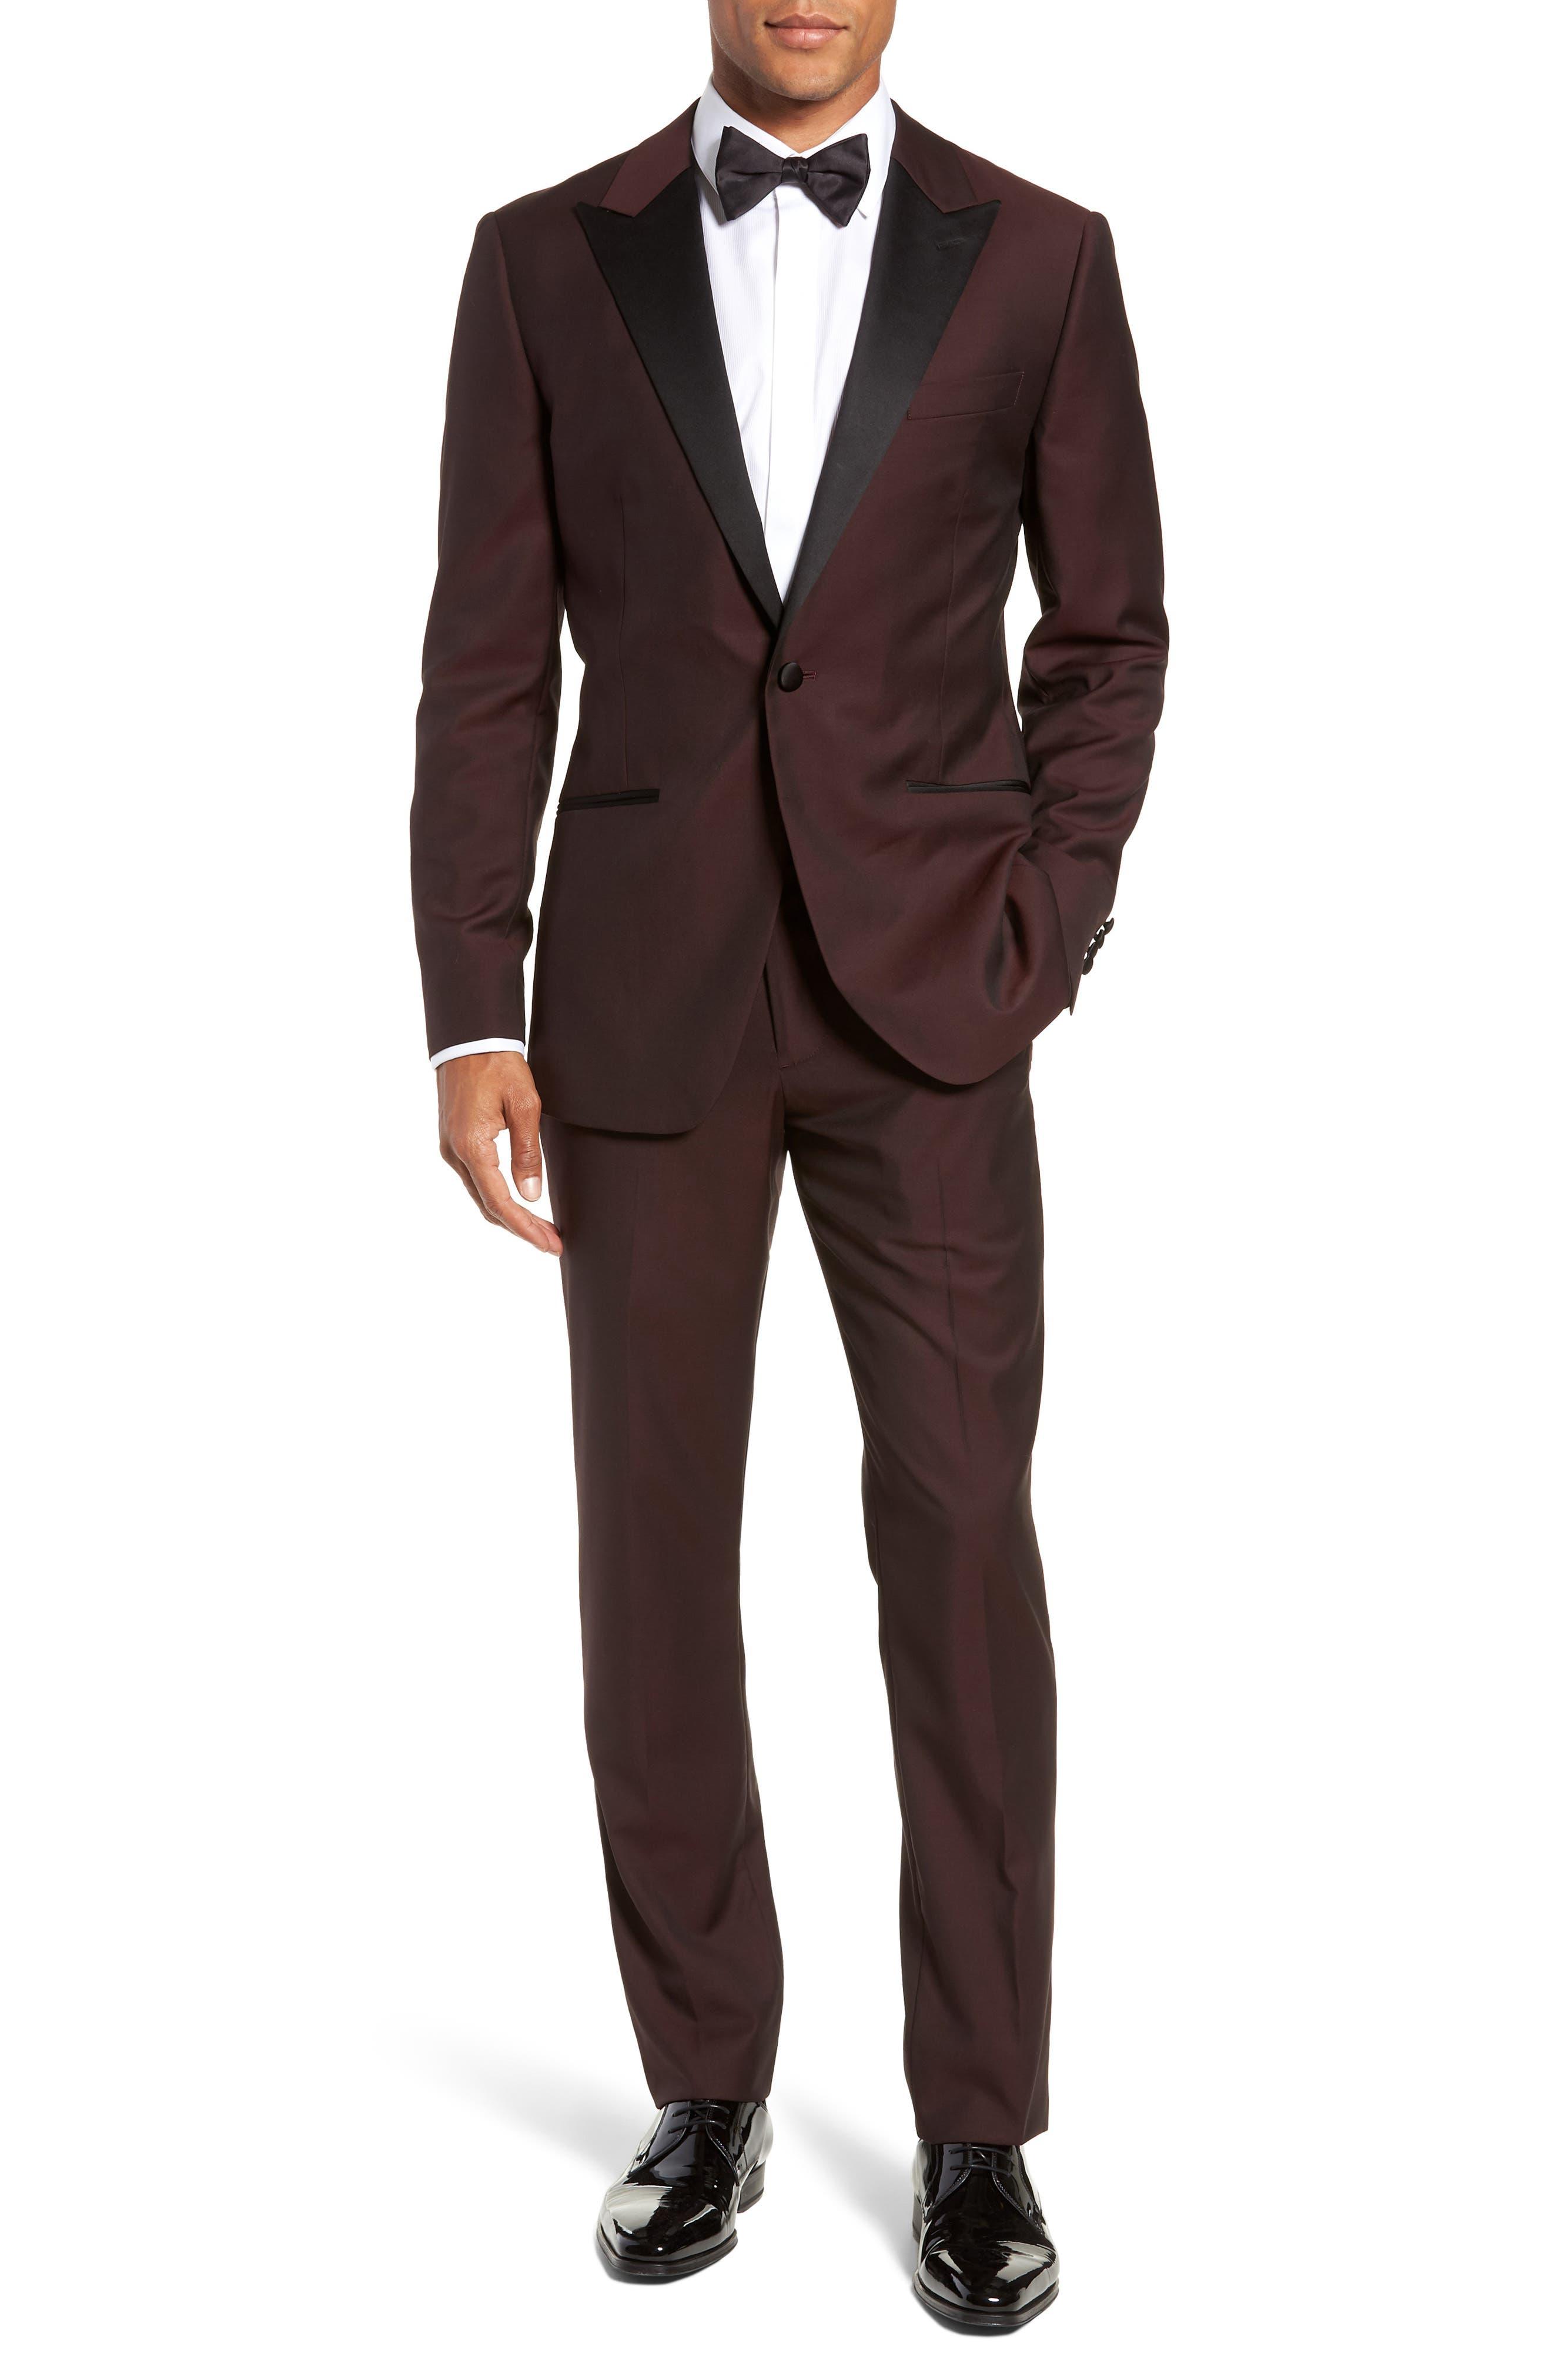 Capstone Slim Fit Tuxedo Trousers,                             Alternate thumbnail 7, color,                             MAROON